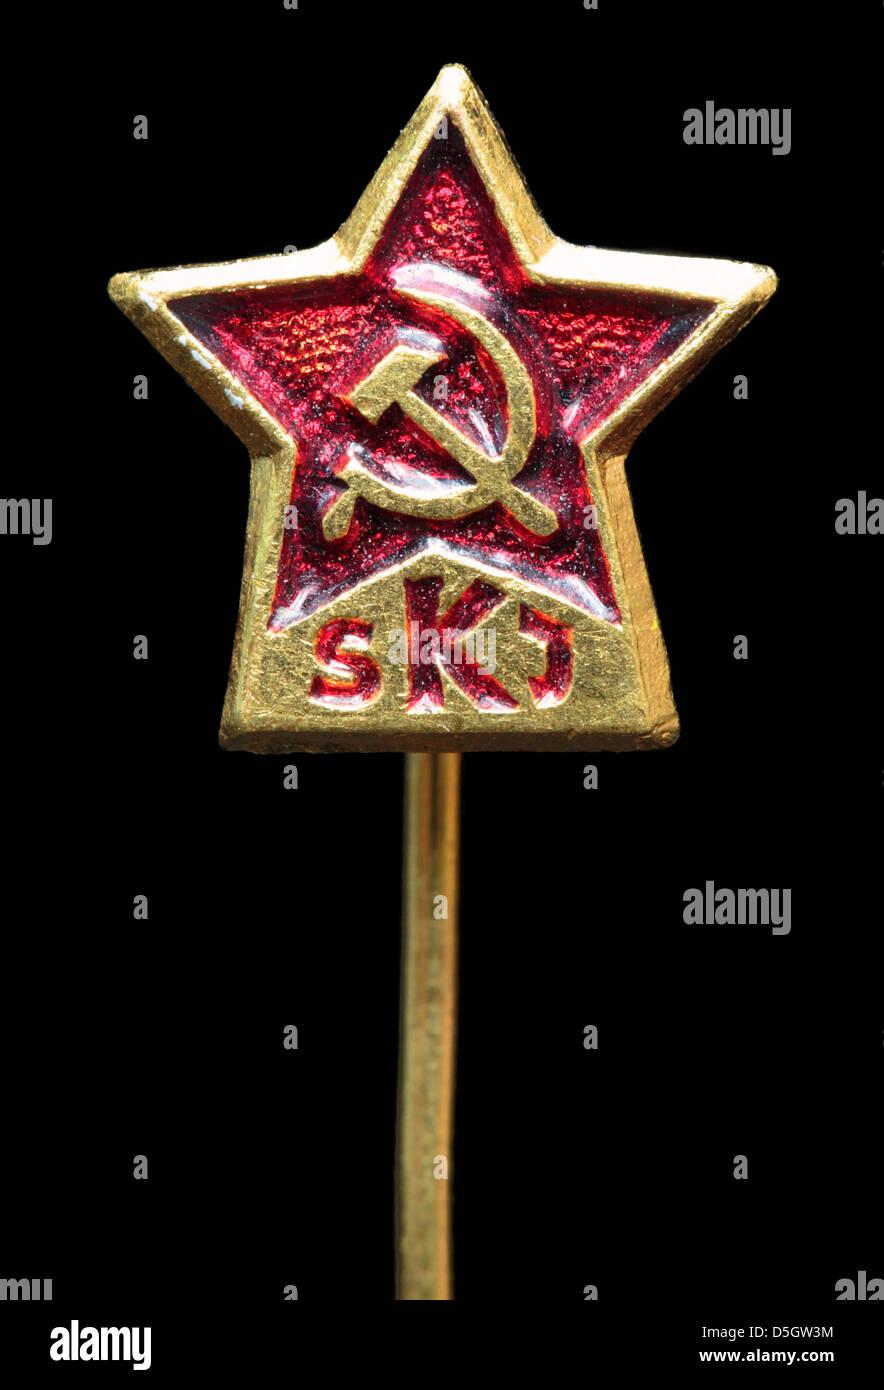 League of Communists of Yugoslavia (Savez komunista Jugoslavije) pin badge, Jugoslavia - Stock Image